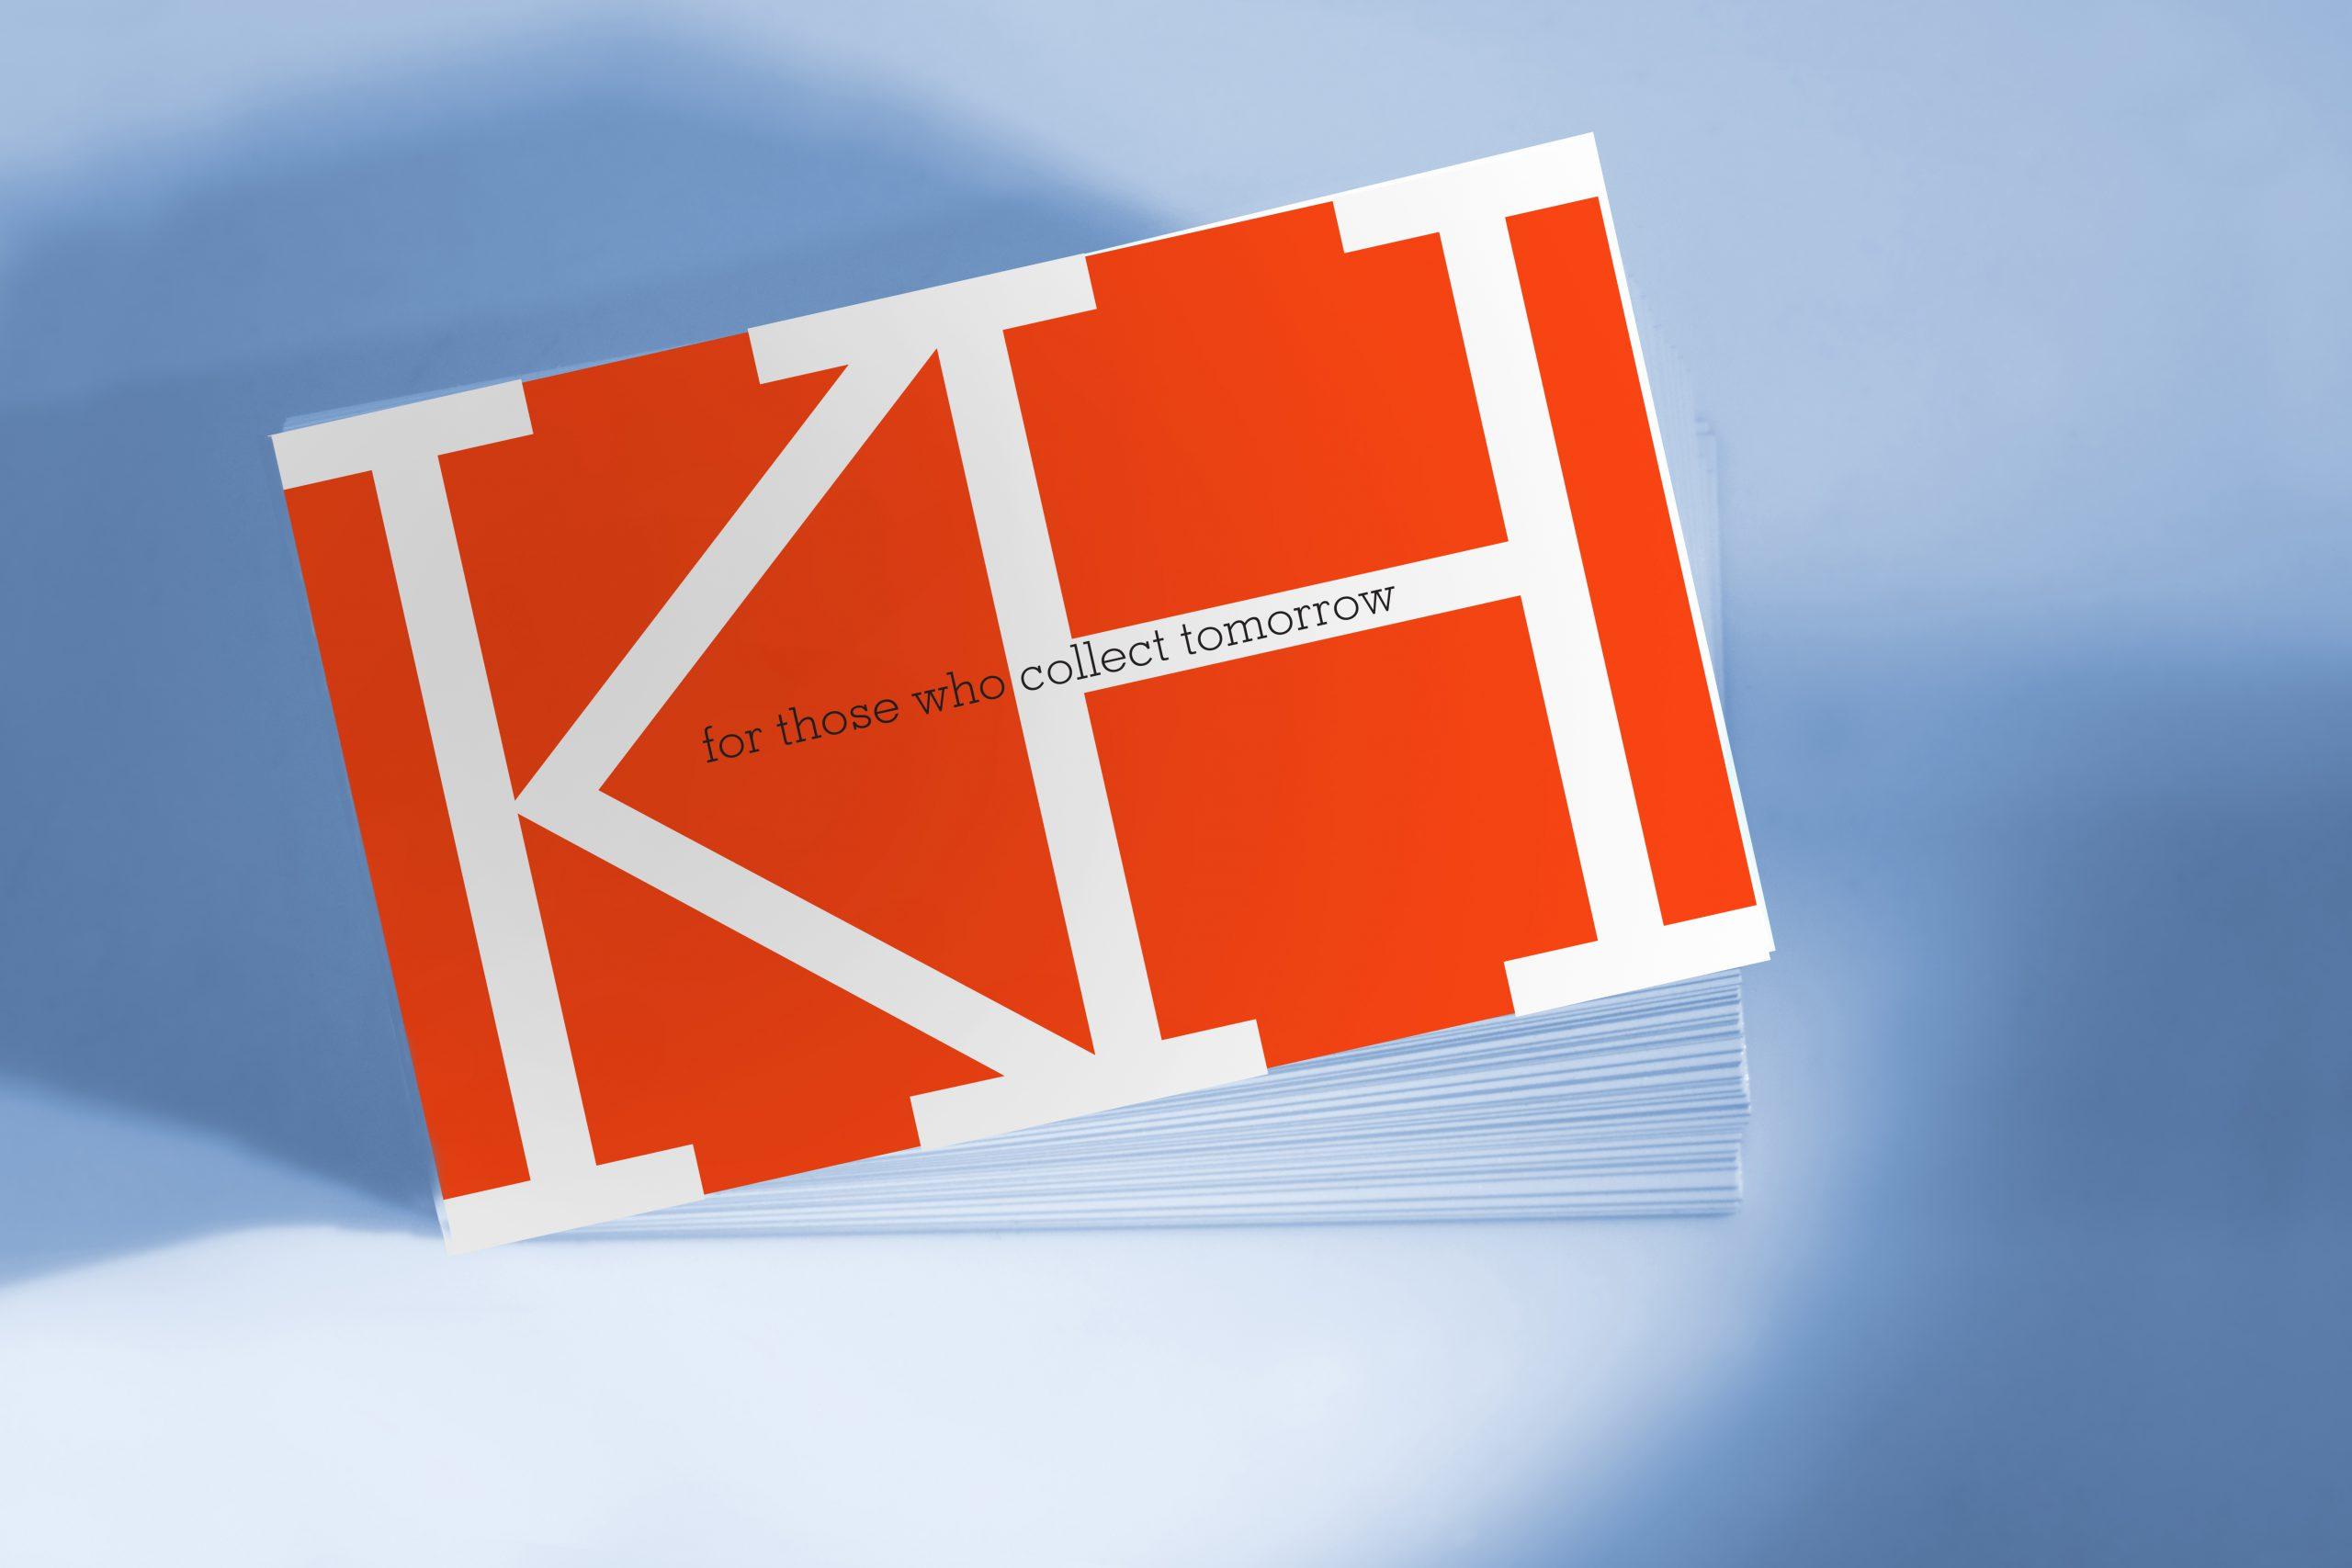 Project Image for Kristin Hjellegjerde Gallery, Brand Identity